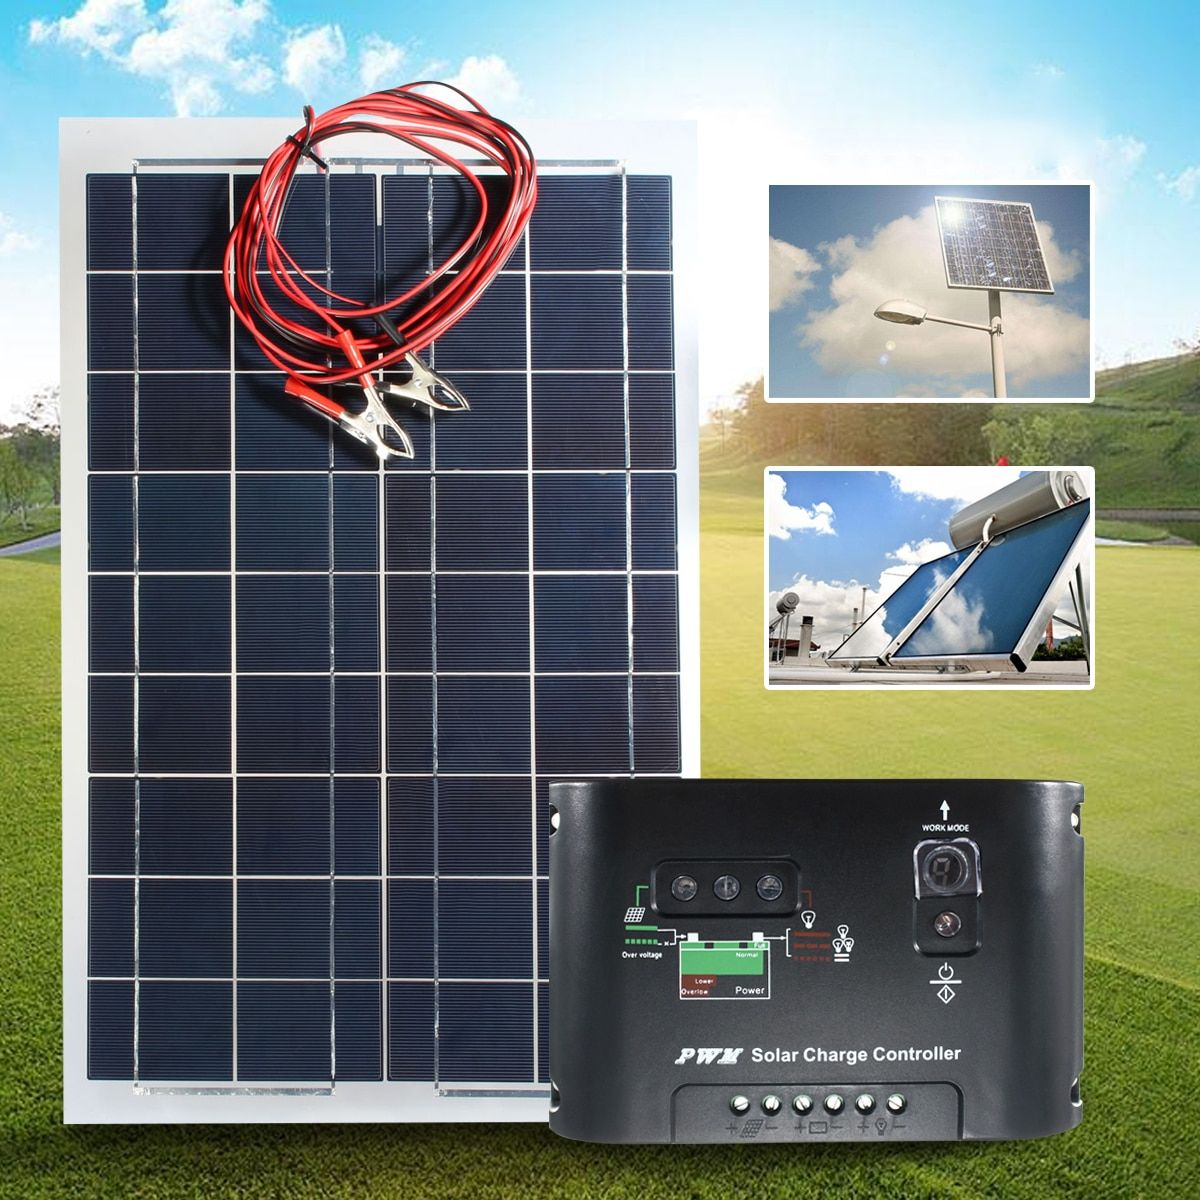 KINCO Flexible Solar Panel Plate 12V 30W Solar Charger For Car Battery 12V Sunpower Monocrystalline Cells + 10A PWM Controller